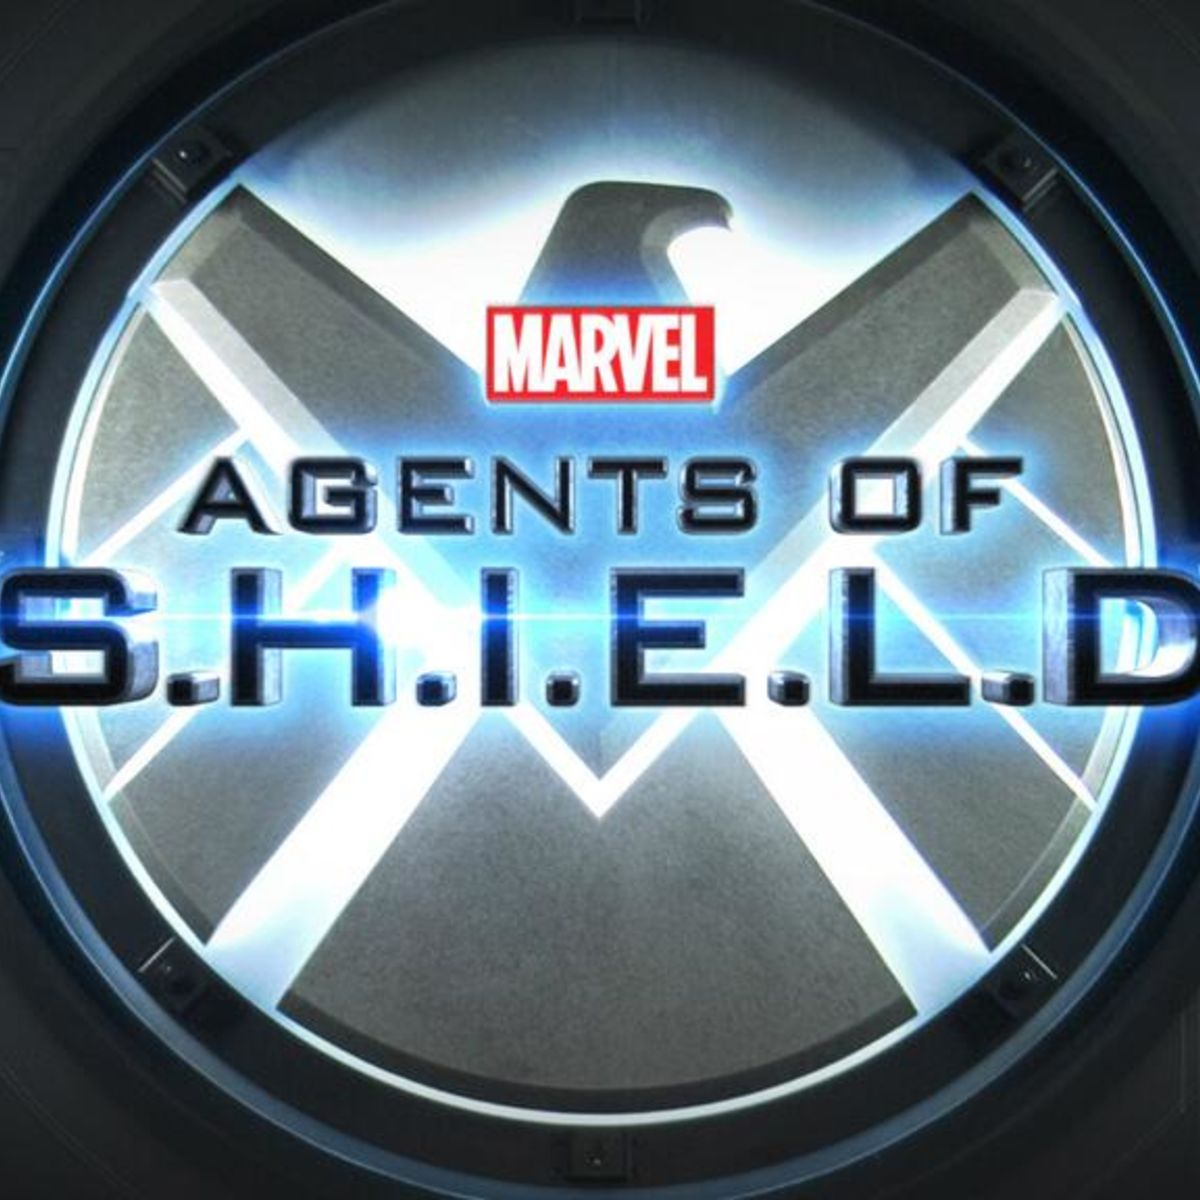 agents-of-shield-logo.jpg